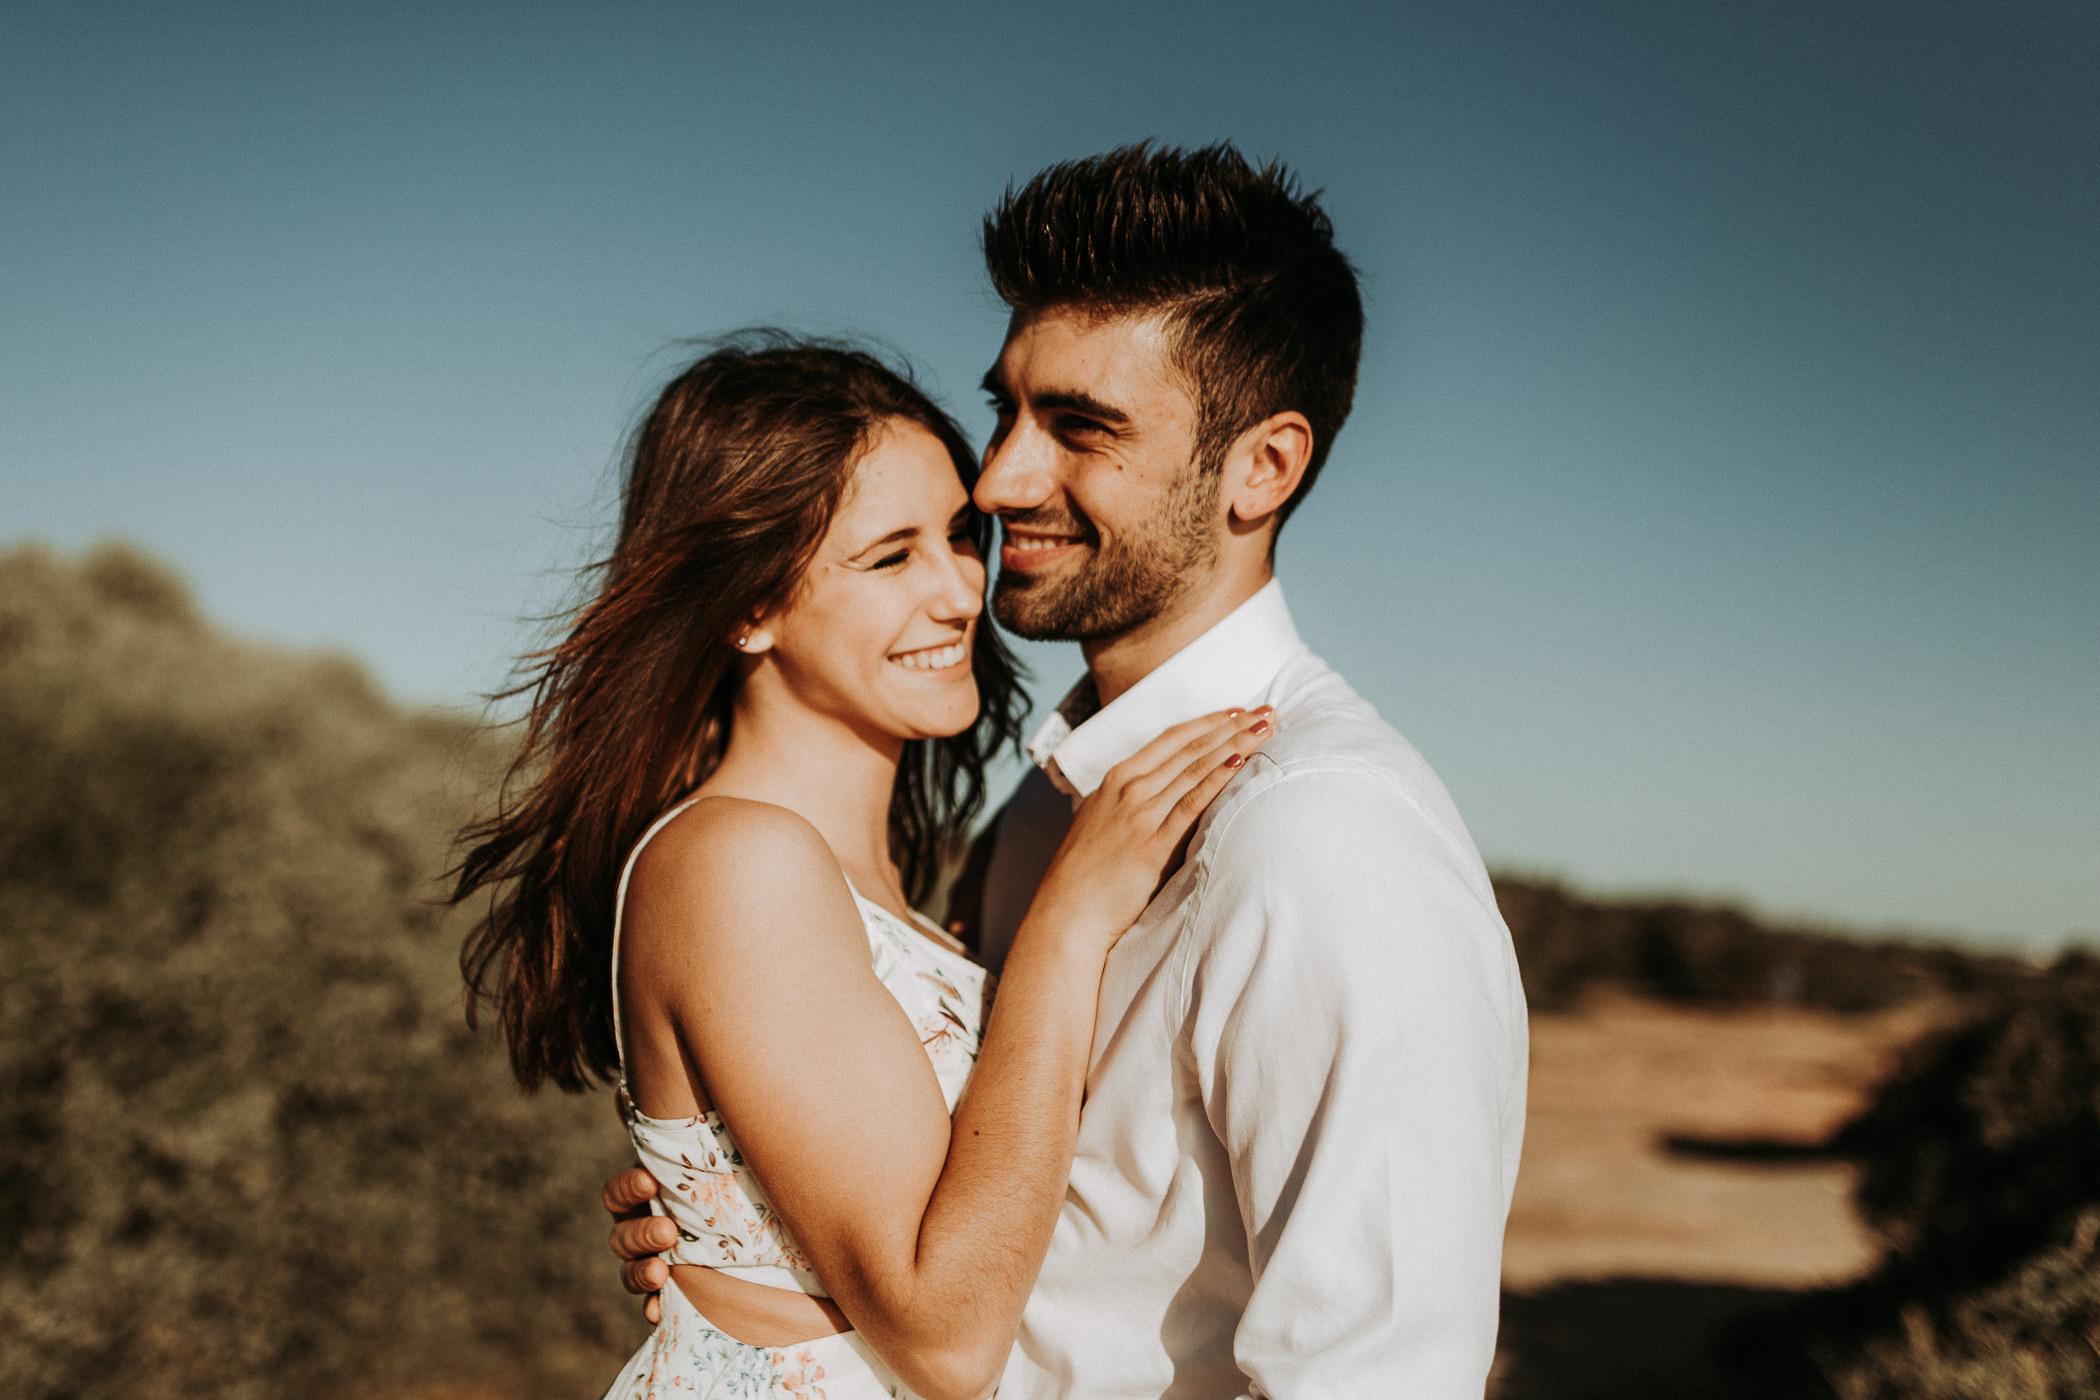 DanielaMarquardtPhotography_wedding_elopement_mallorca_spain_calapi_palma_lauraandtoni_321